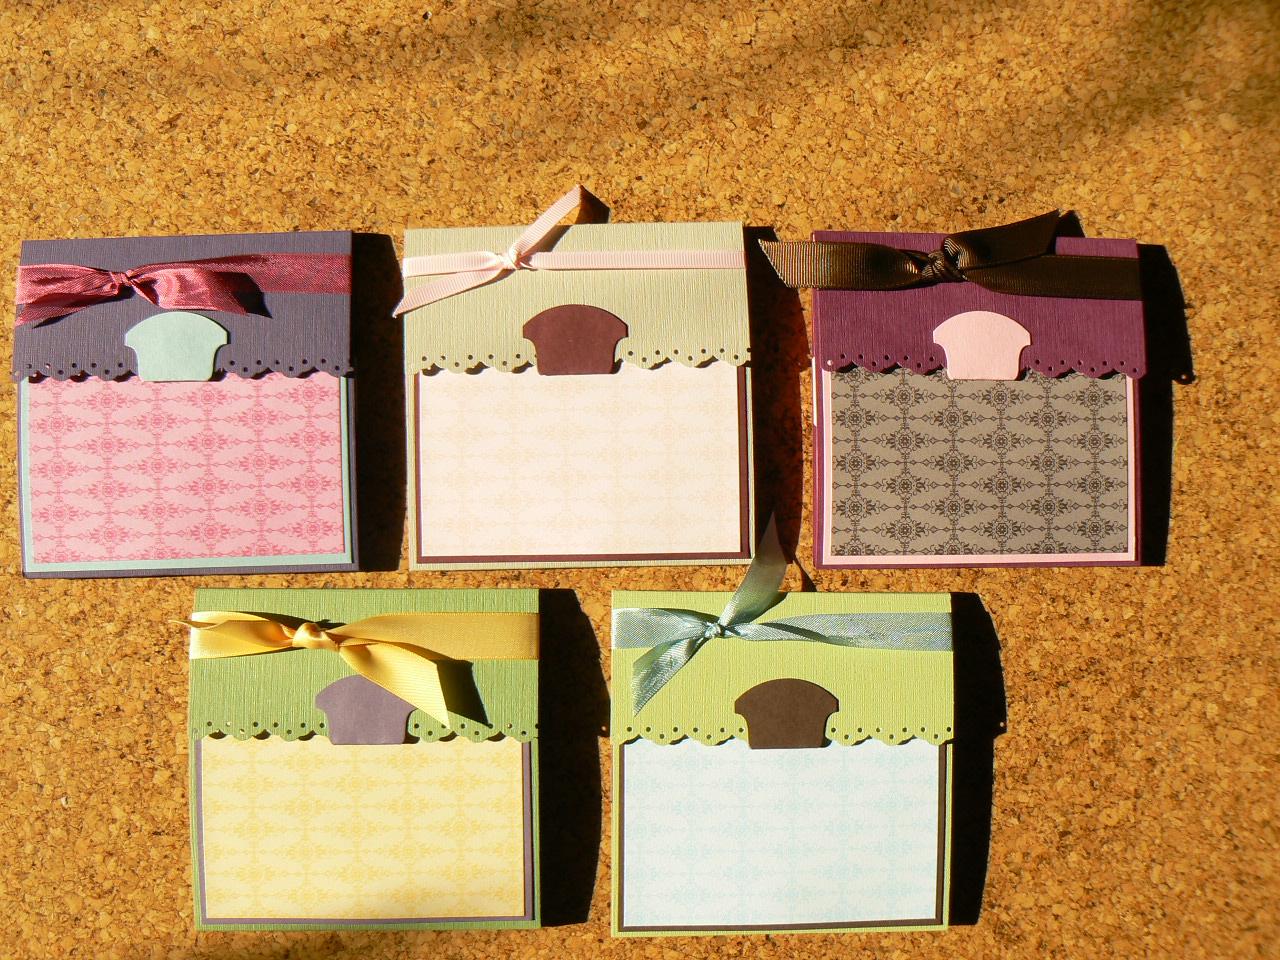 kreatives aus papier 30 frauen basteln teil 2 das stamp camp album. Black Bedroom Furniture Sets. Home Design Ideas